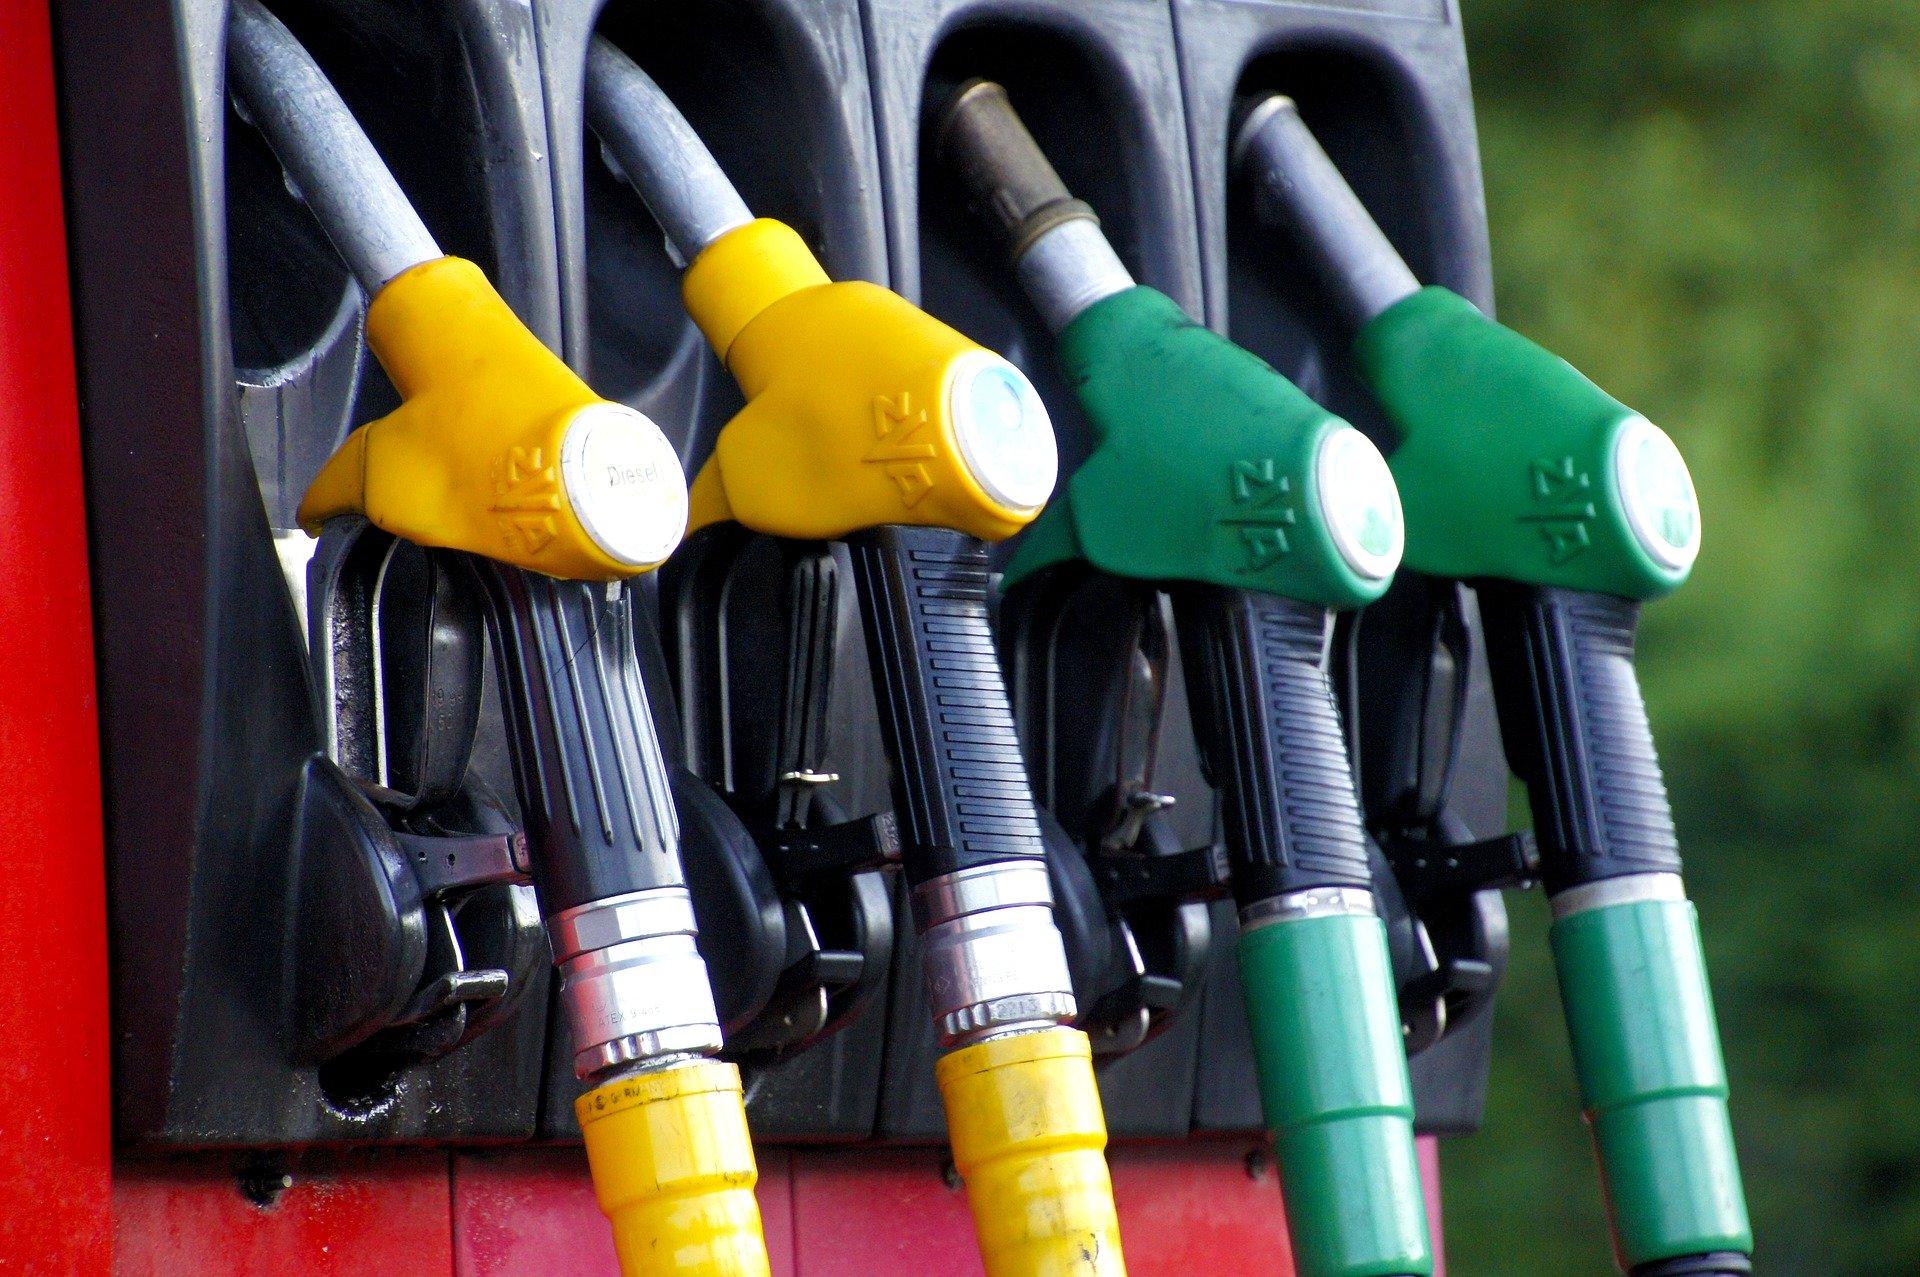 Supermarkets slash fuel prices to 'lowest level since 2018'